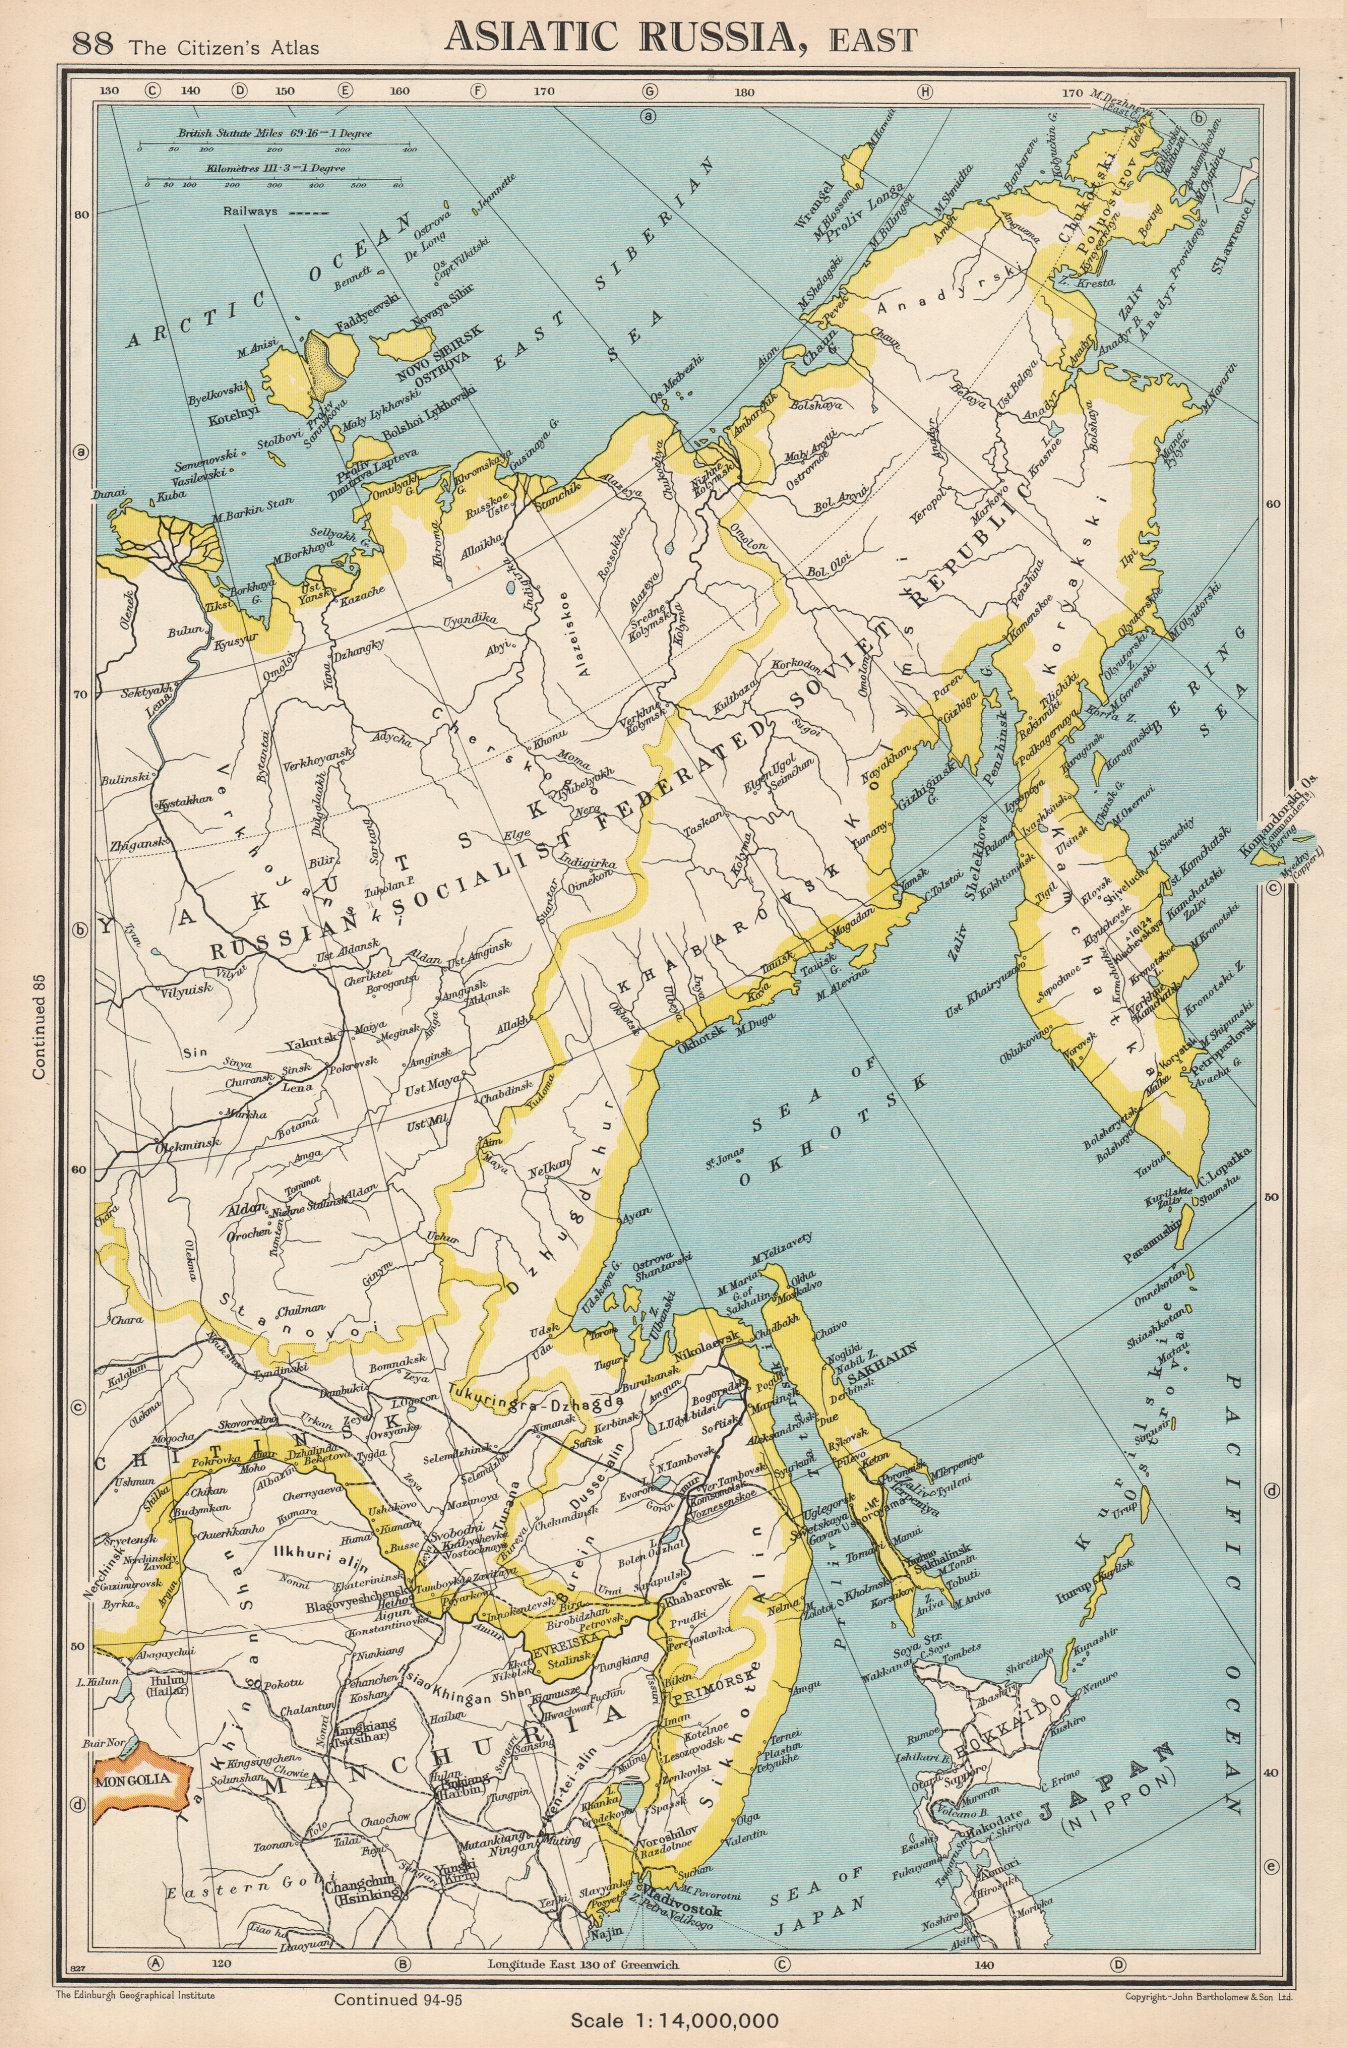 Associate Product ASIATIC RUSSIA, EAST. Siberia Yakutsk Sakhalin. BARTHOLOMEW 1952 old map